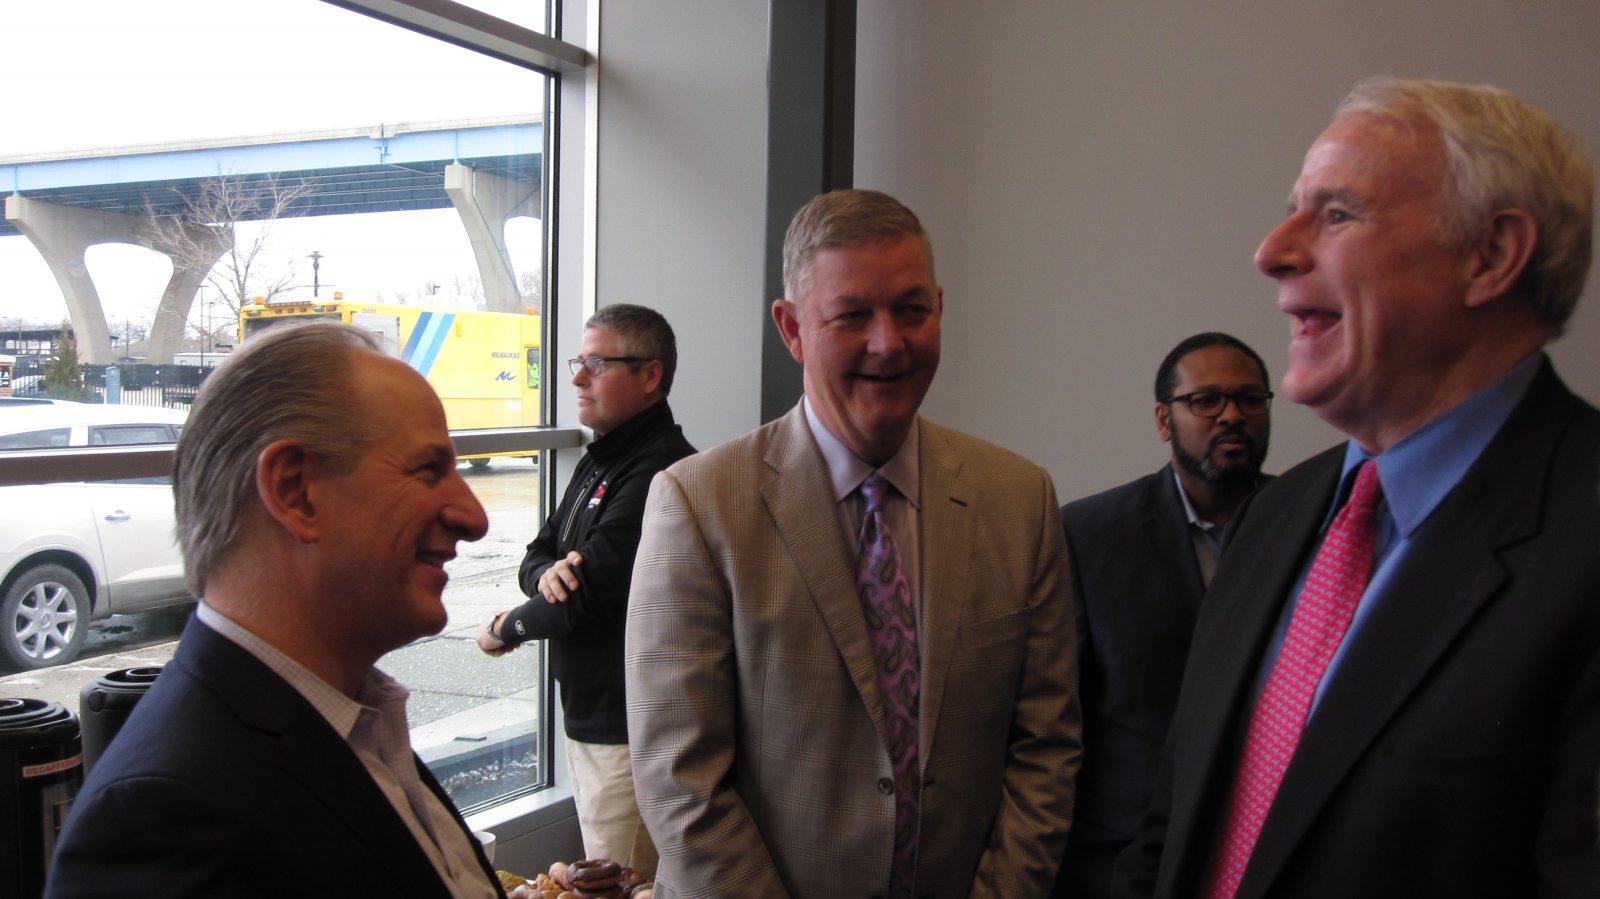 Greg Marcus, Tim Sheehy and Tom Barrett. Ashanti Hamilton in the background.